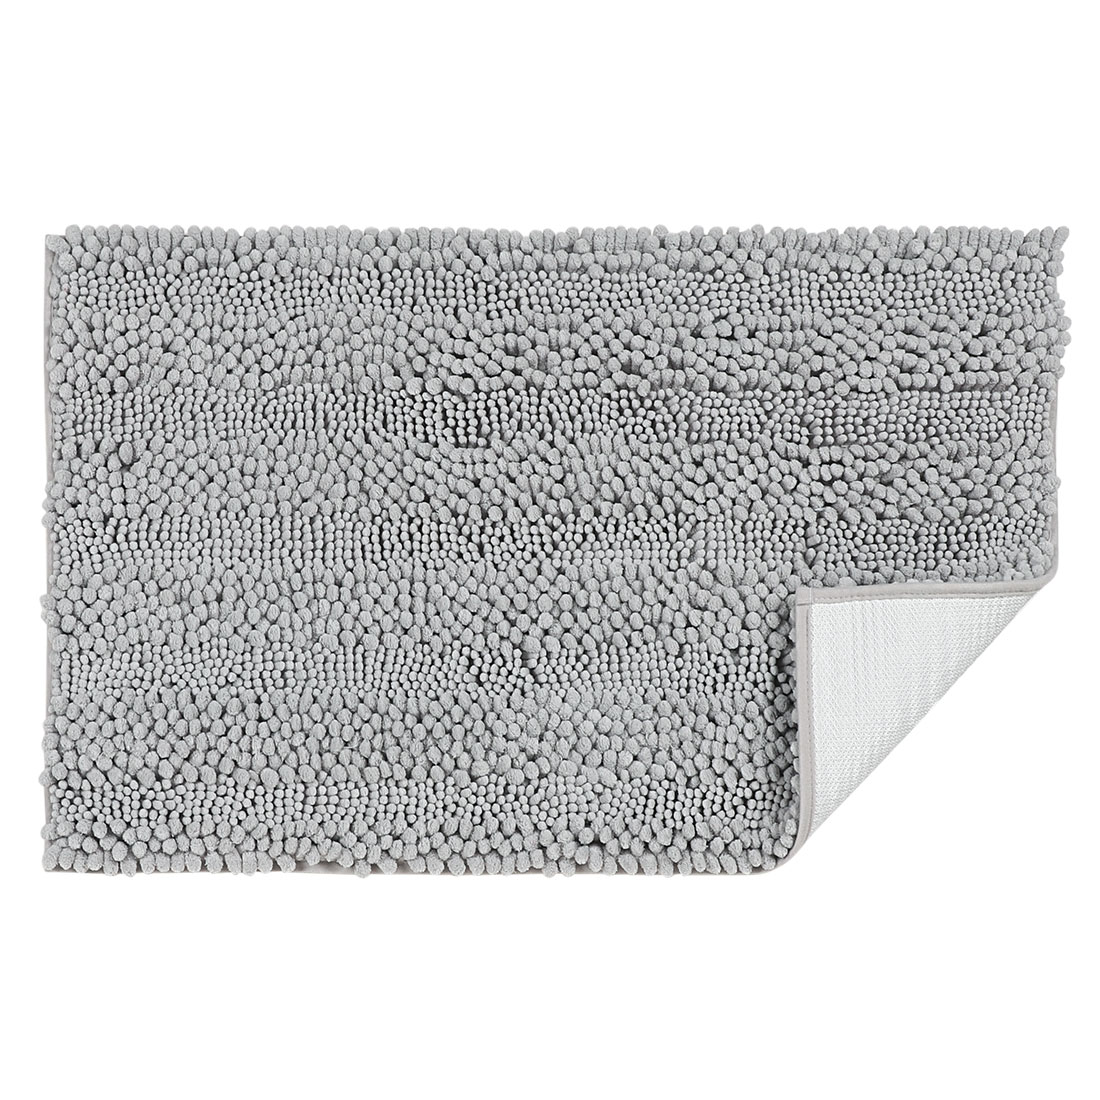 20 x 32 Inch Luxury Soft Plush Shaggy Bath Mat Chenille Rug Carpet Light Gray